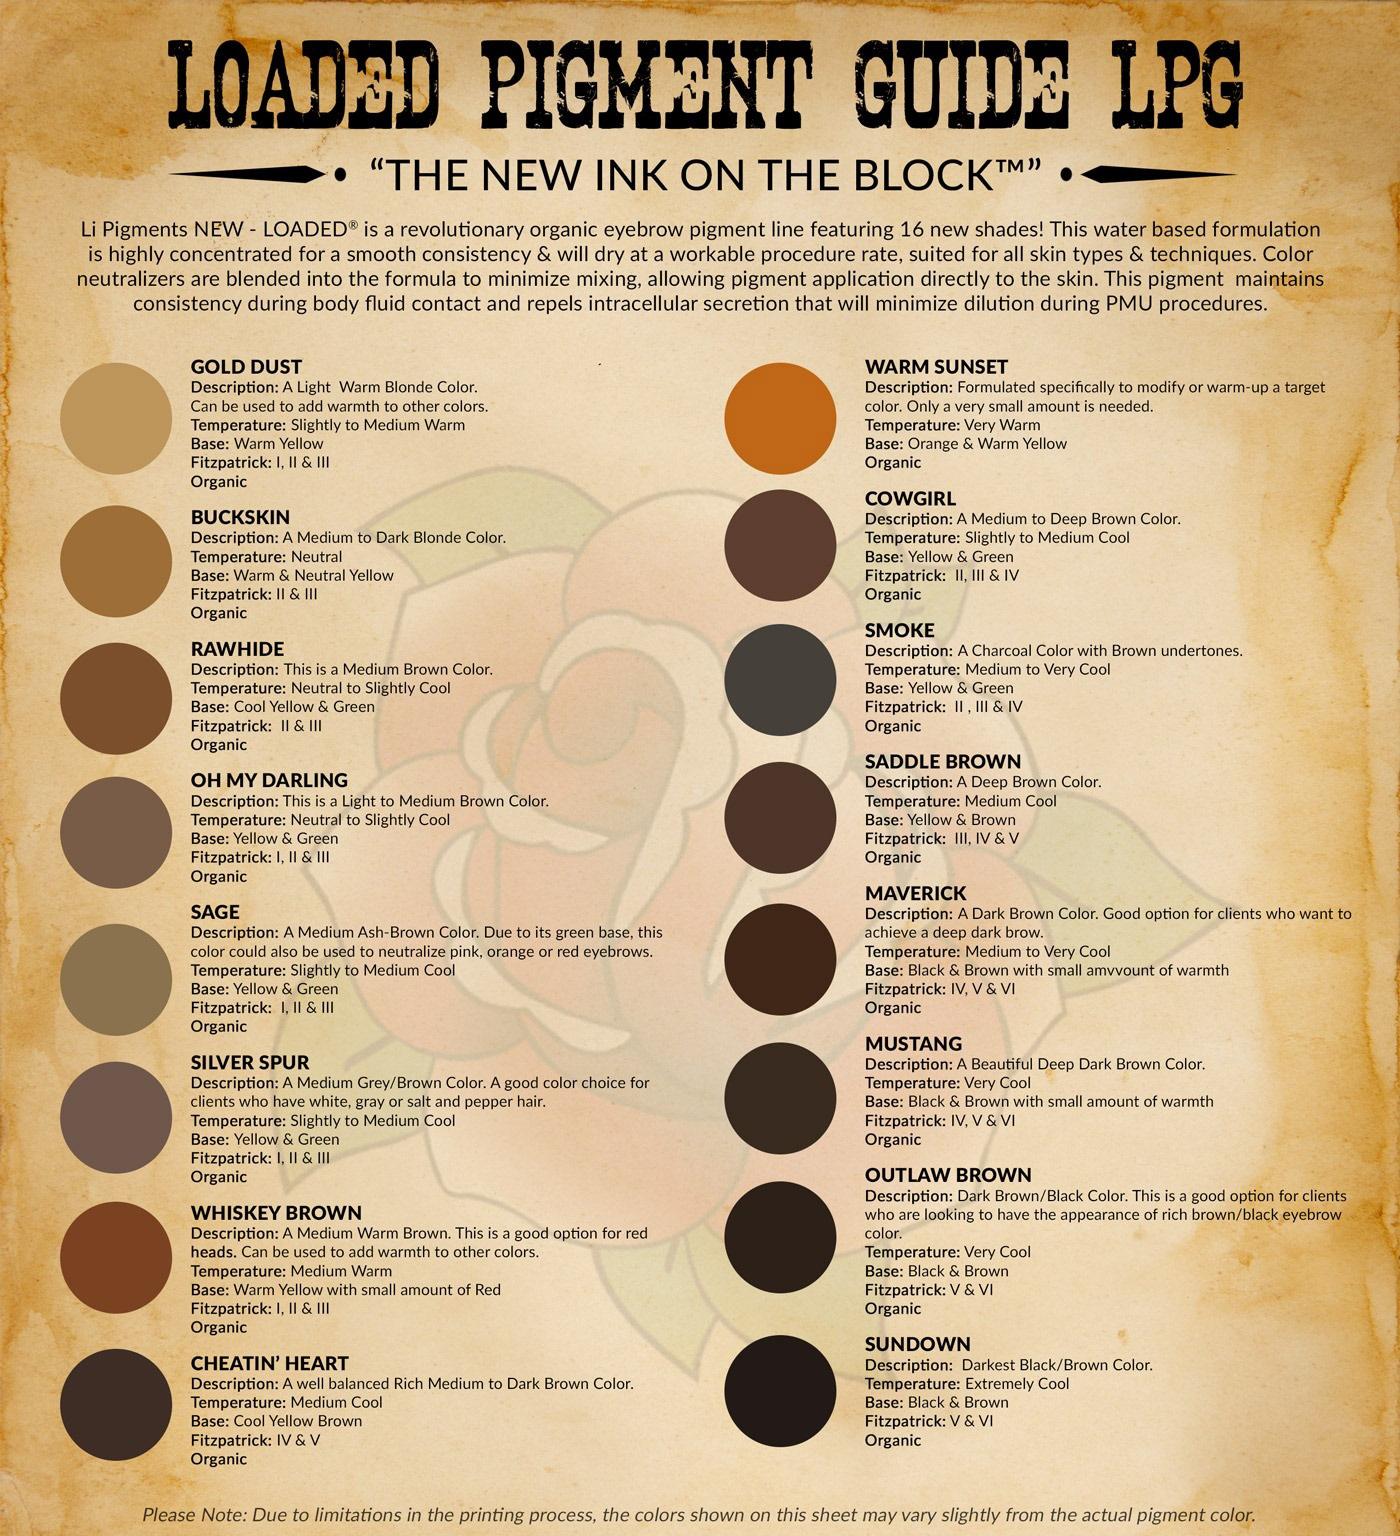 Loaded Pigment Guide (LPG) - JPEG.jpg